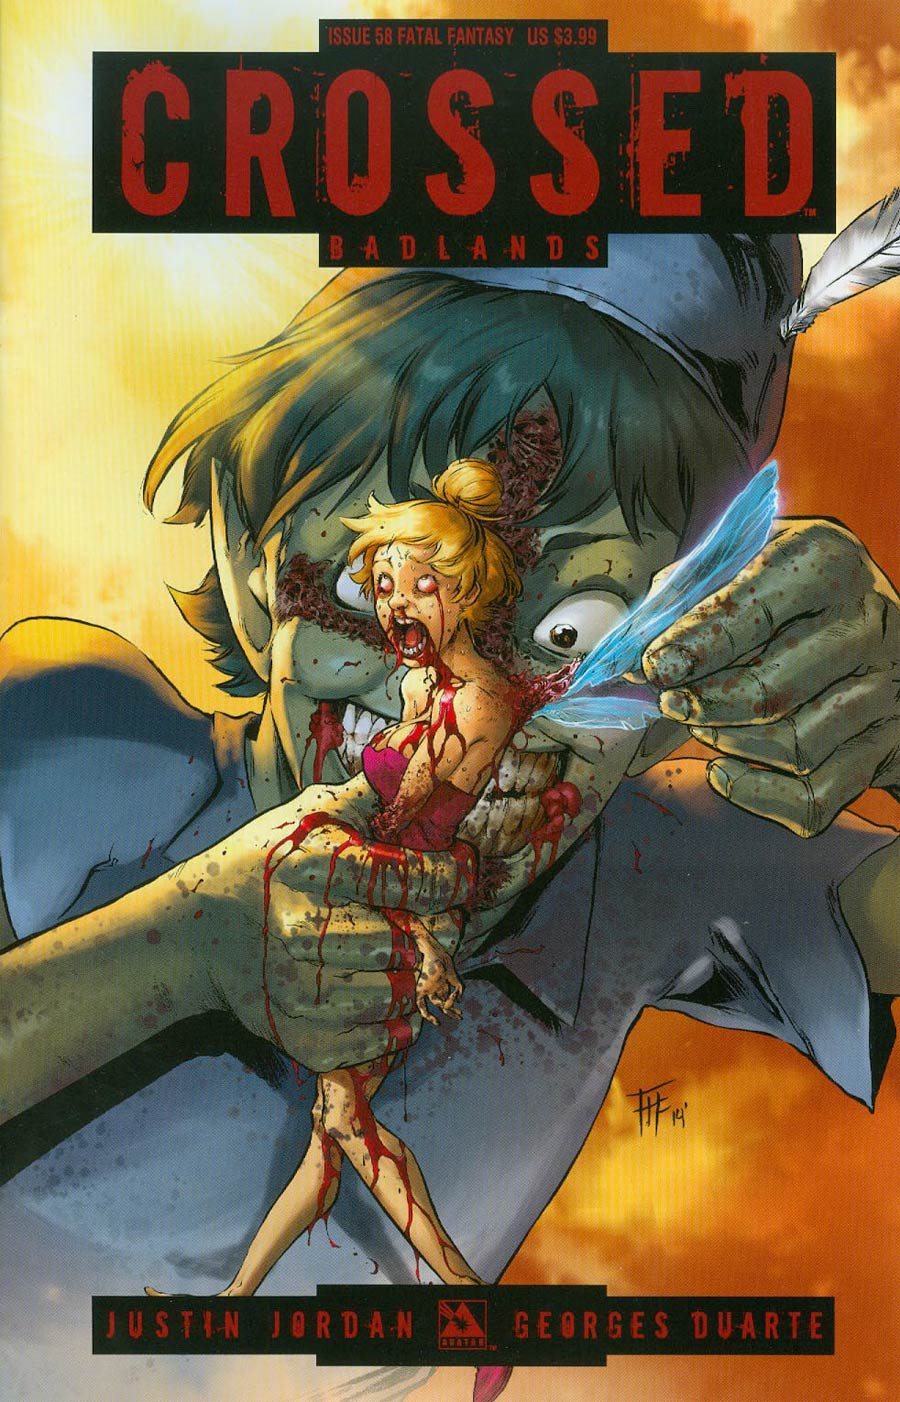 Crossed Badlands #58 Cover D Fatal Fantasy Cover